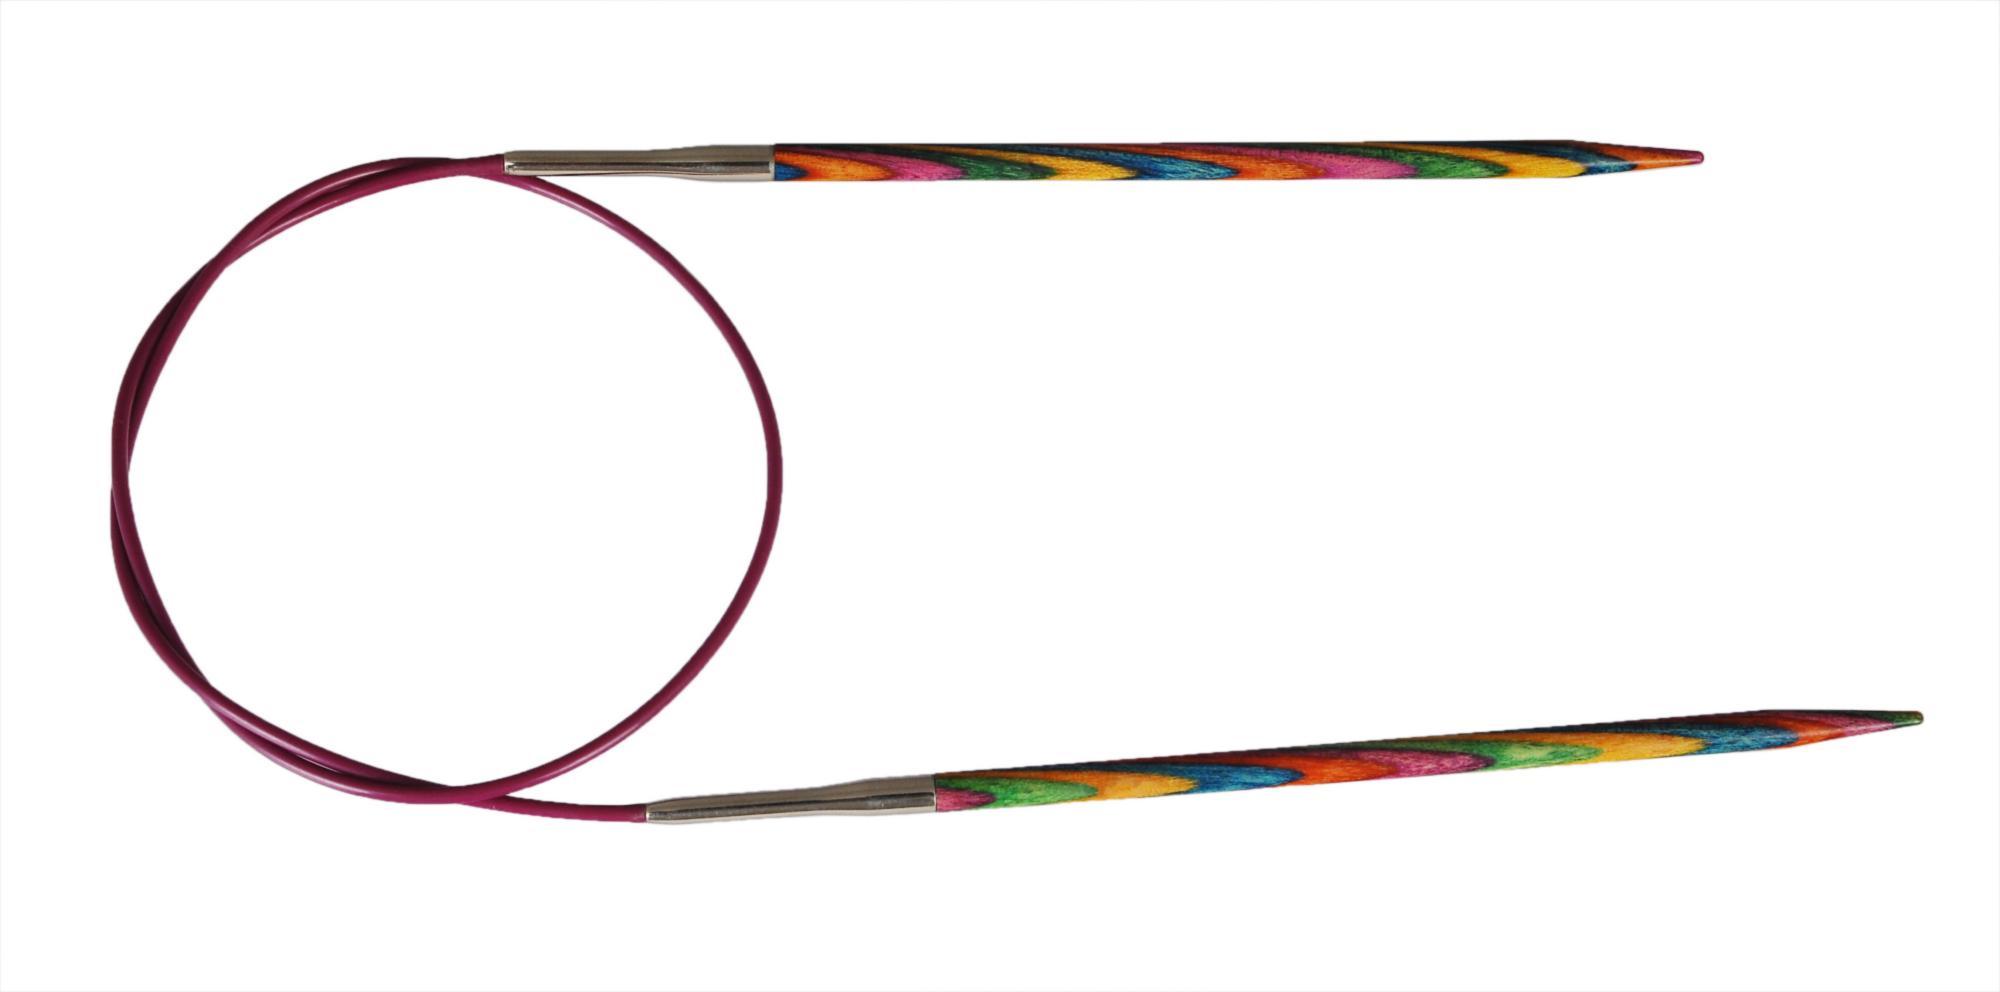 Спицы круговые 120 см Symfonie Wood KnitPro, 21365, 3.50 мм